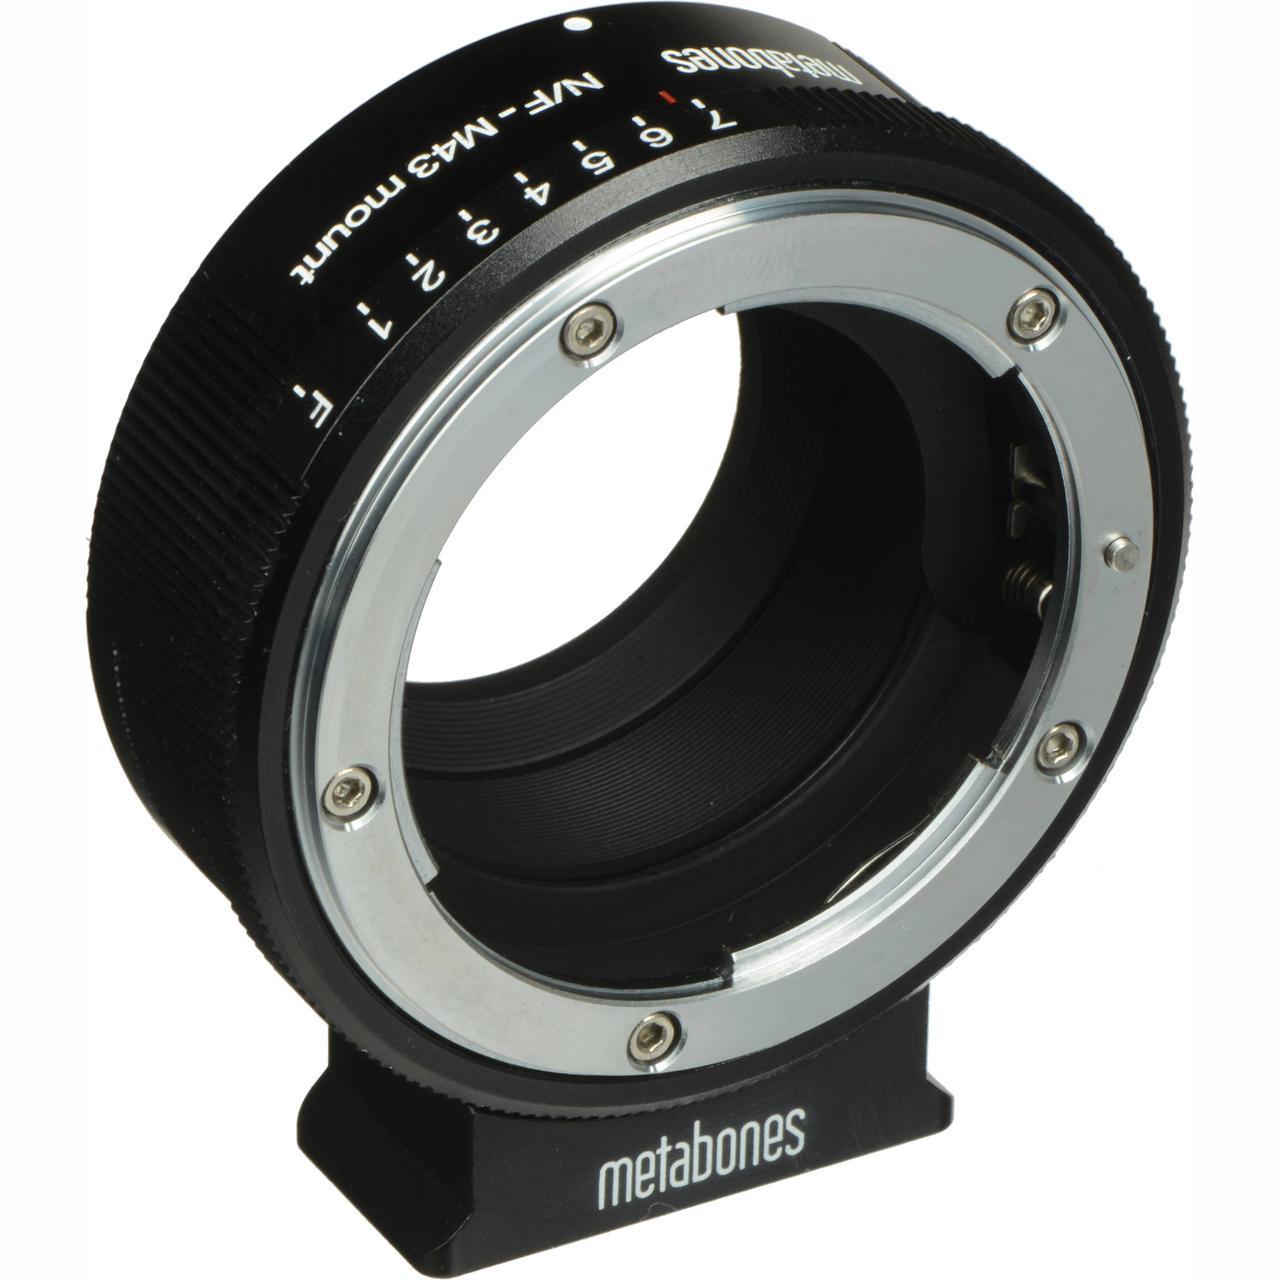 Metabones Nikon G Lens to Micro Four Thirds Lens Mount Adapter (Matte Black) (MB_NFG-M43-BM1)